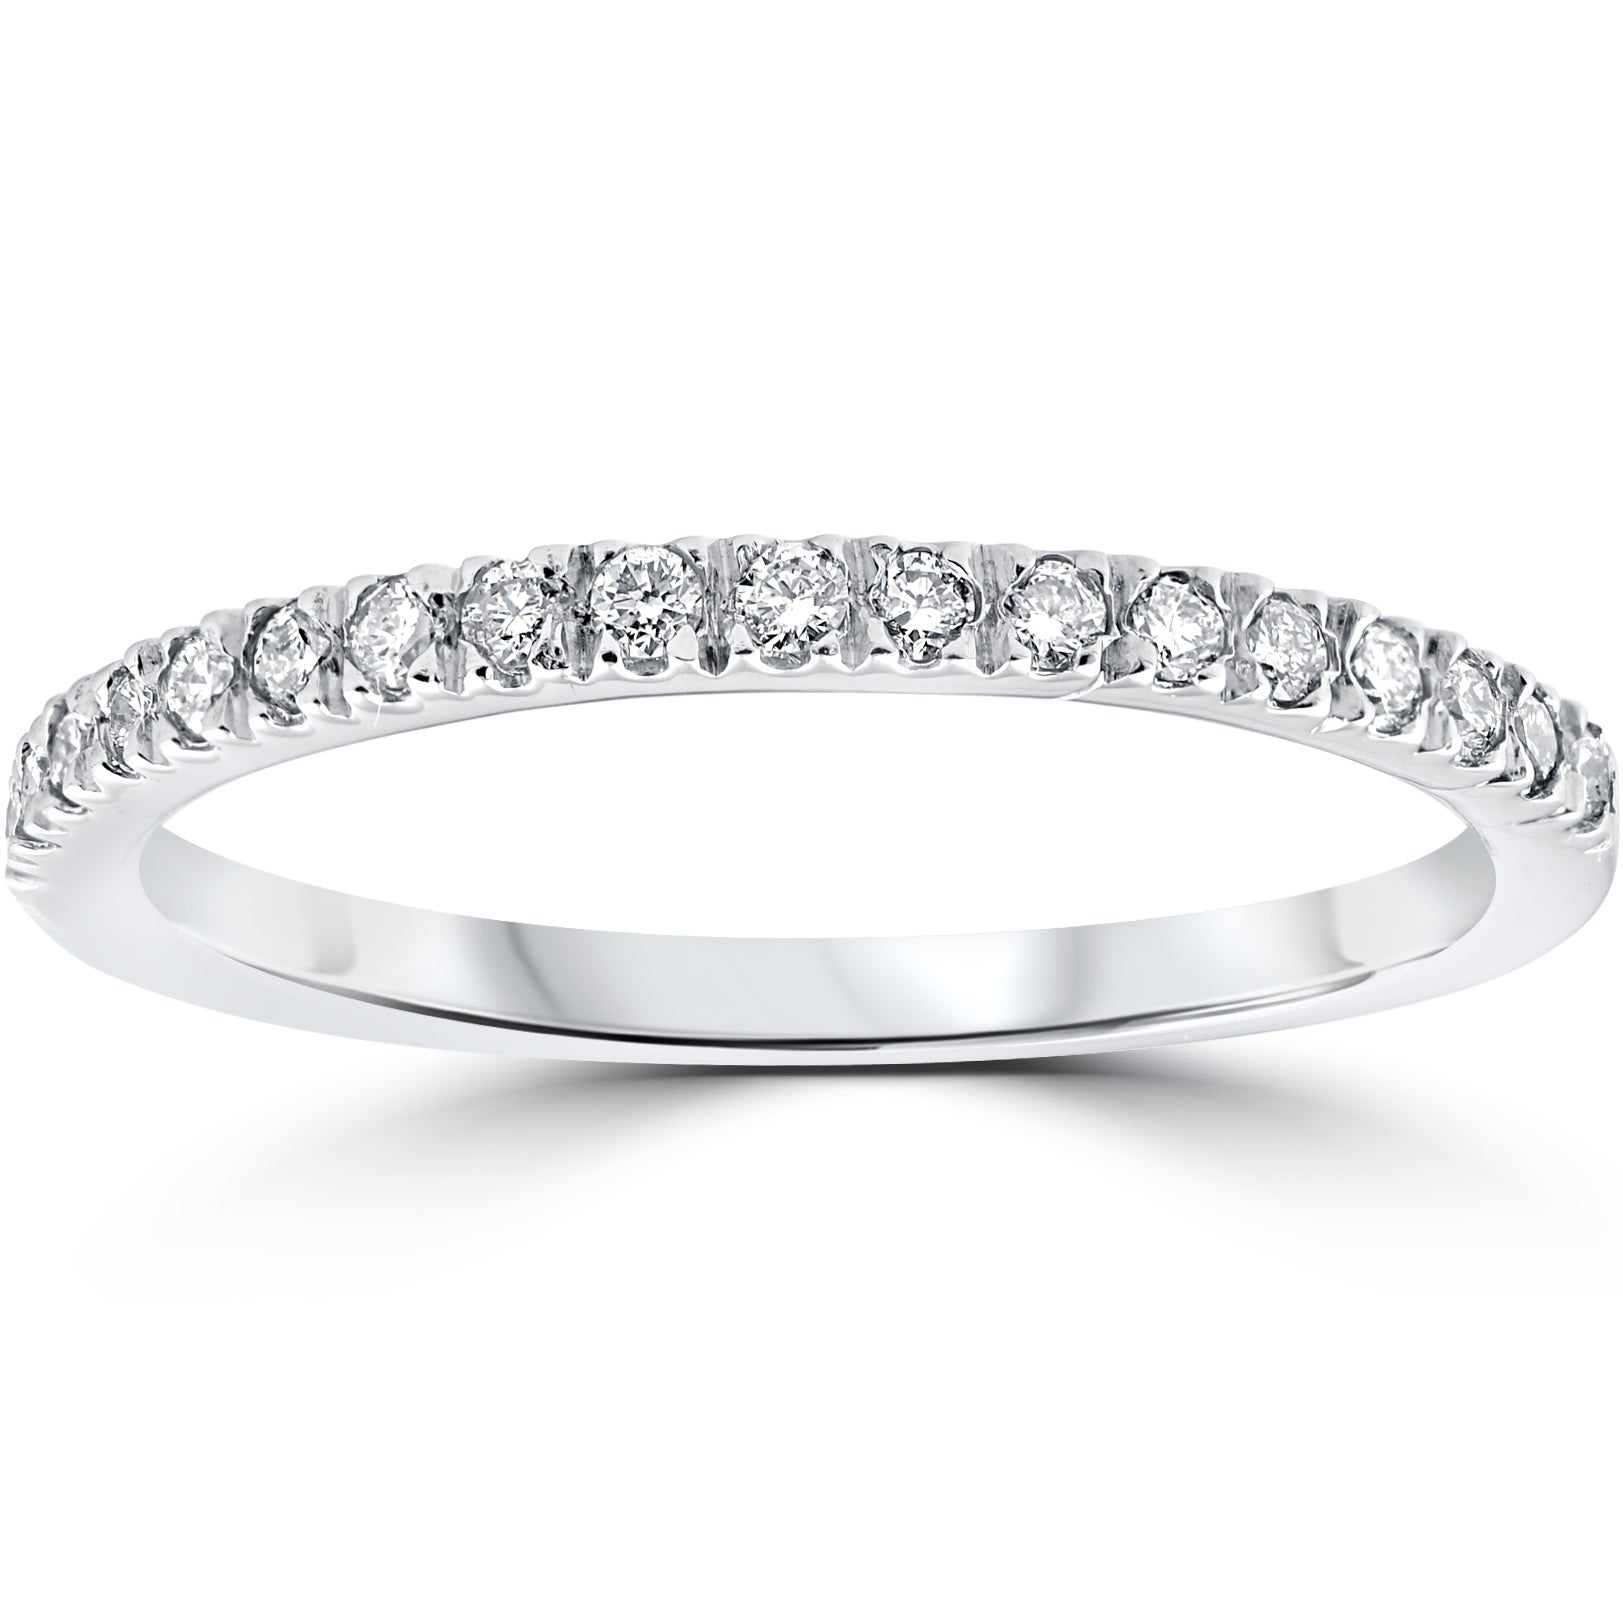 Shop 14k White Gold 1 3 Ct Tdw Pave Diamond Stackable Wedding Ring